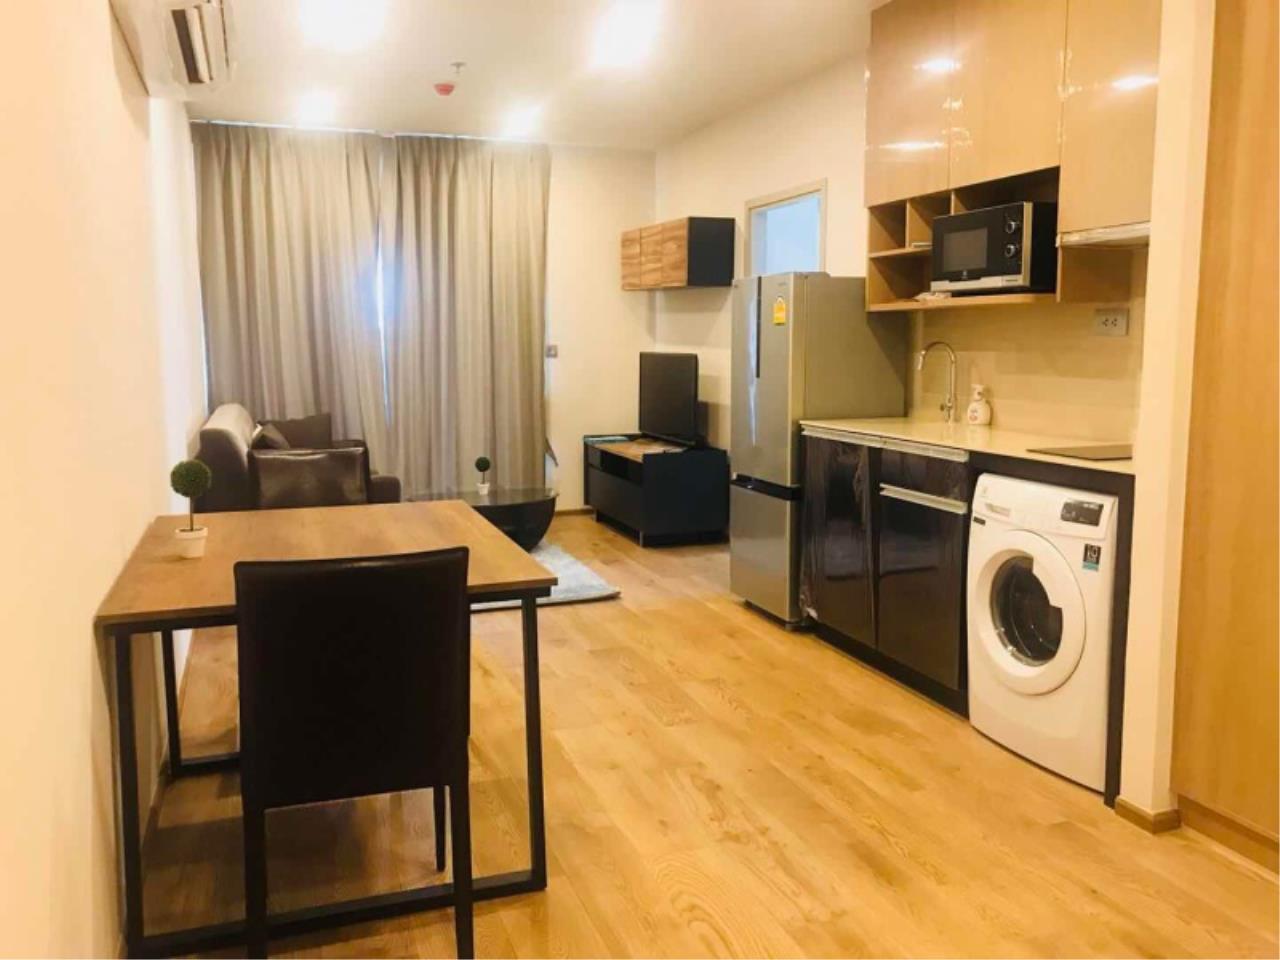 Century21 Skylux Agency's Q Chidlom – Phetchaburi / Condo For Rent / 2 Bedroom / 63 SQM / BTS Chit Lom / Bangkok 1